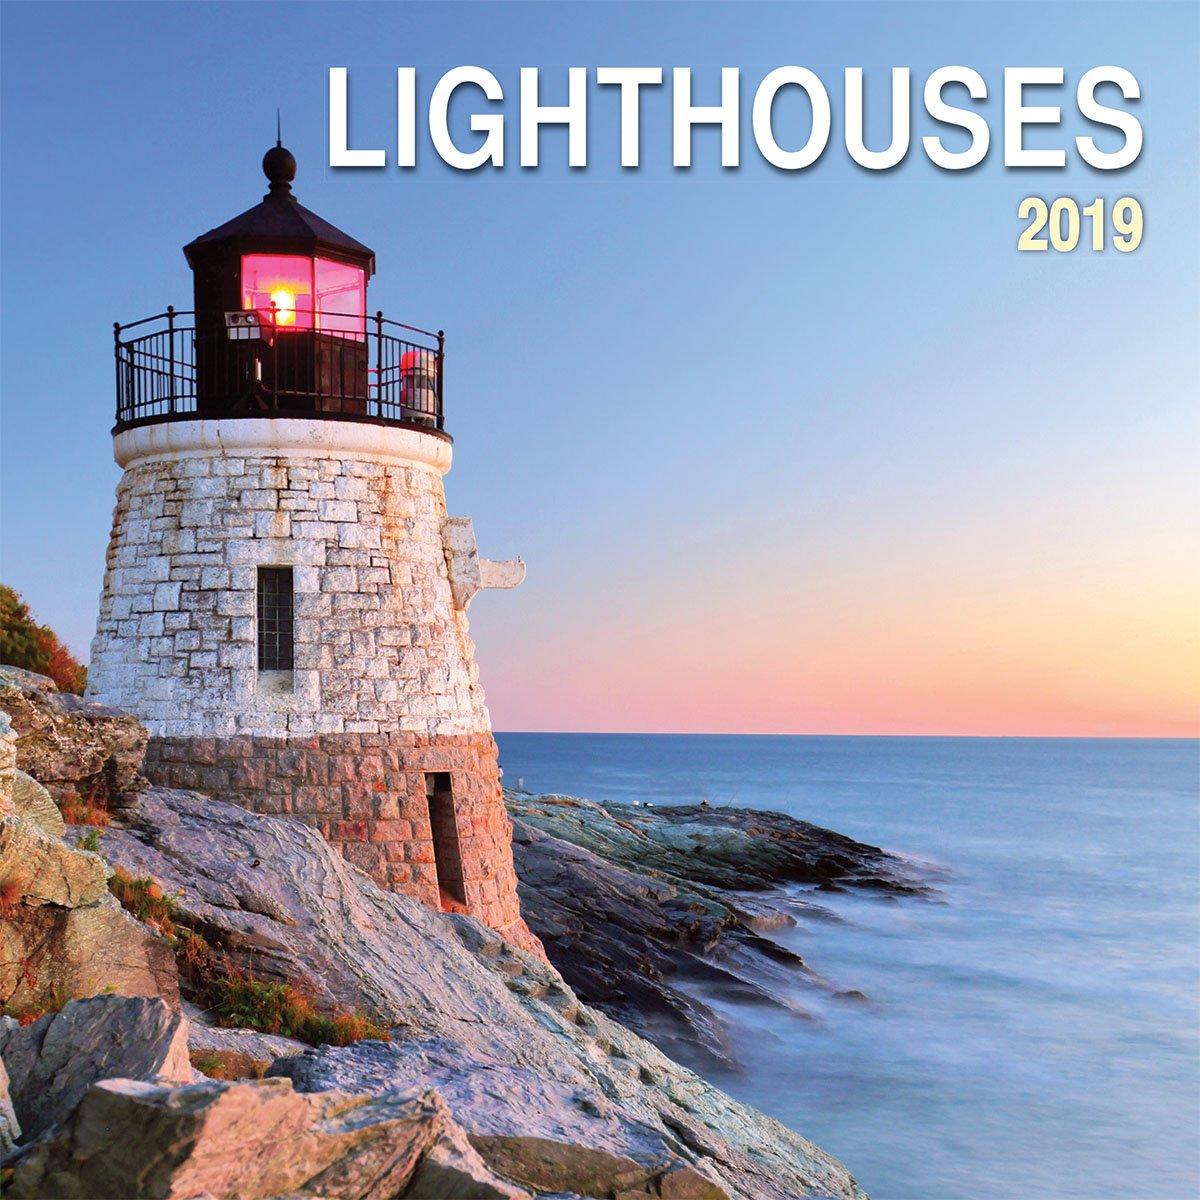 Turner Photo Lighthouses 2019 Wall Calendar (199989400200 Office Wall Calendar (19998940020)